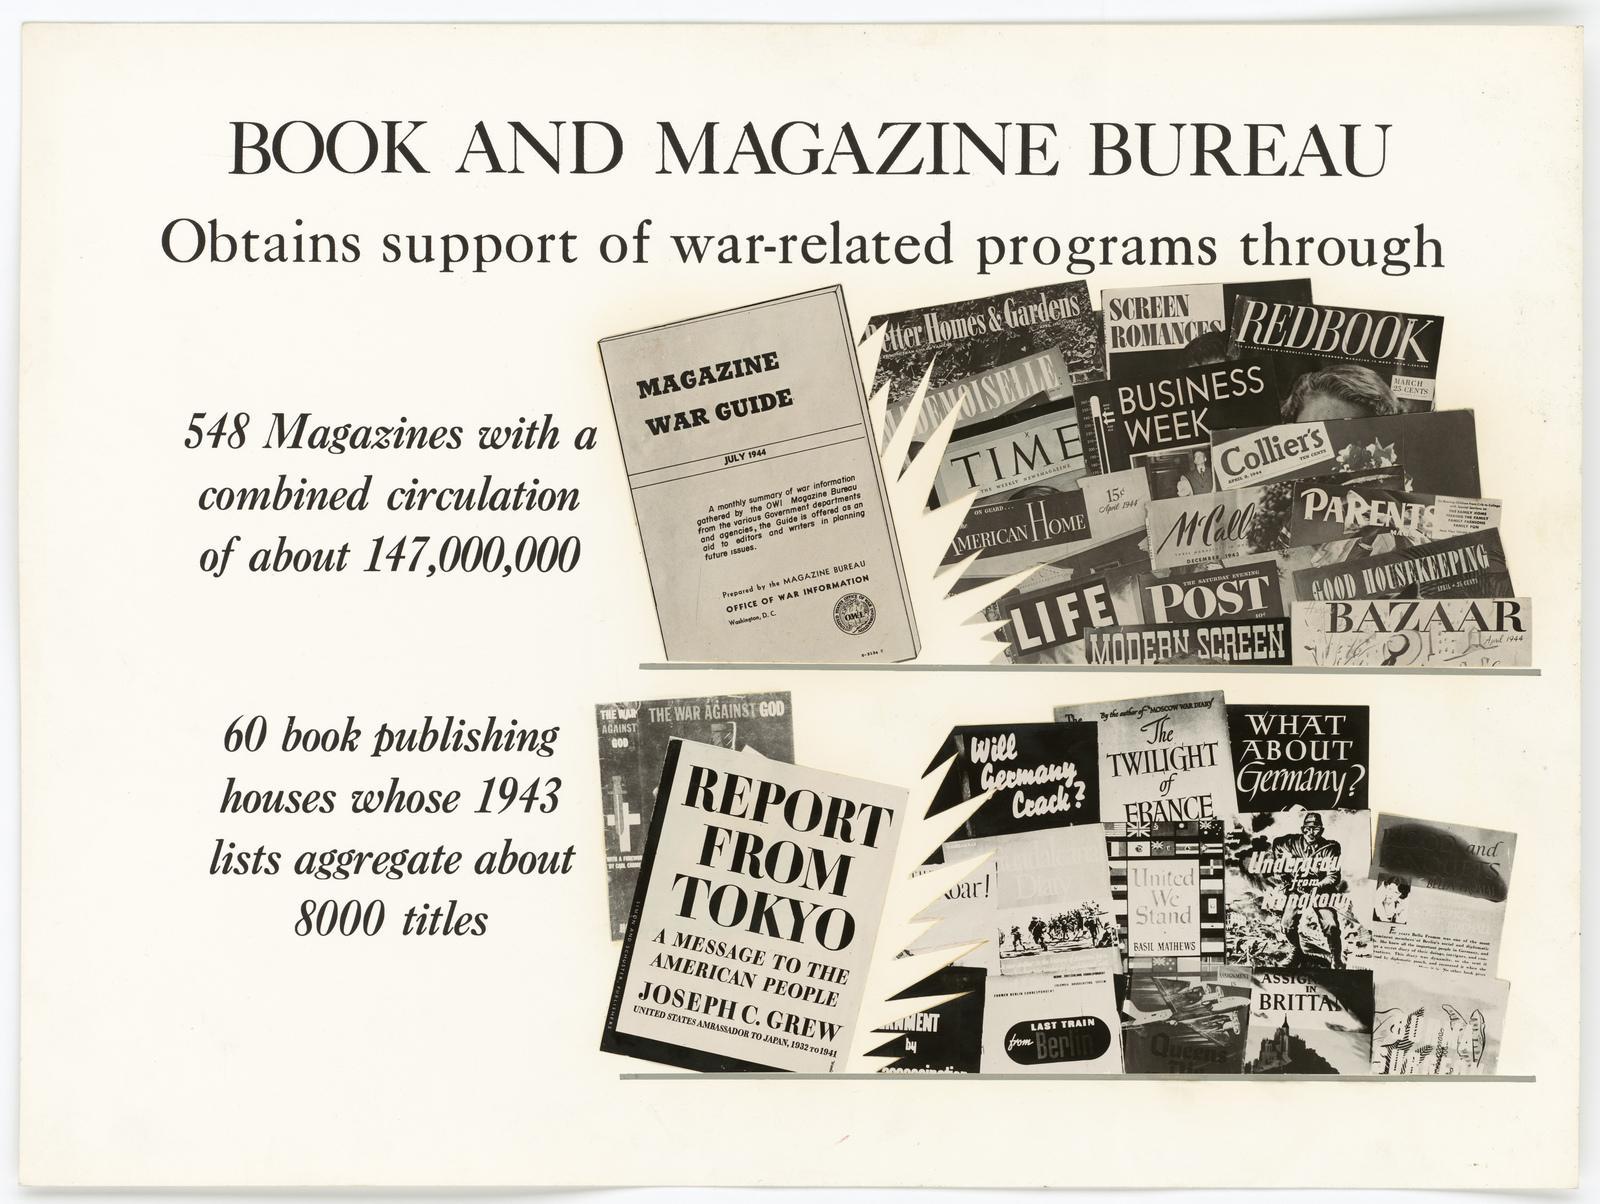 BOOK AND MAGAZINE BUREAU